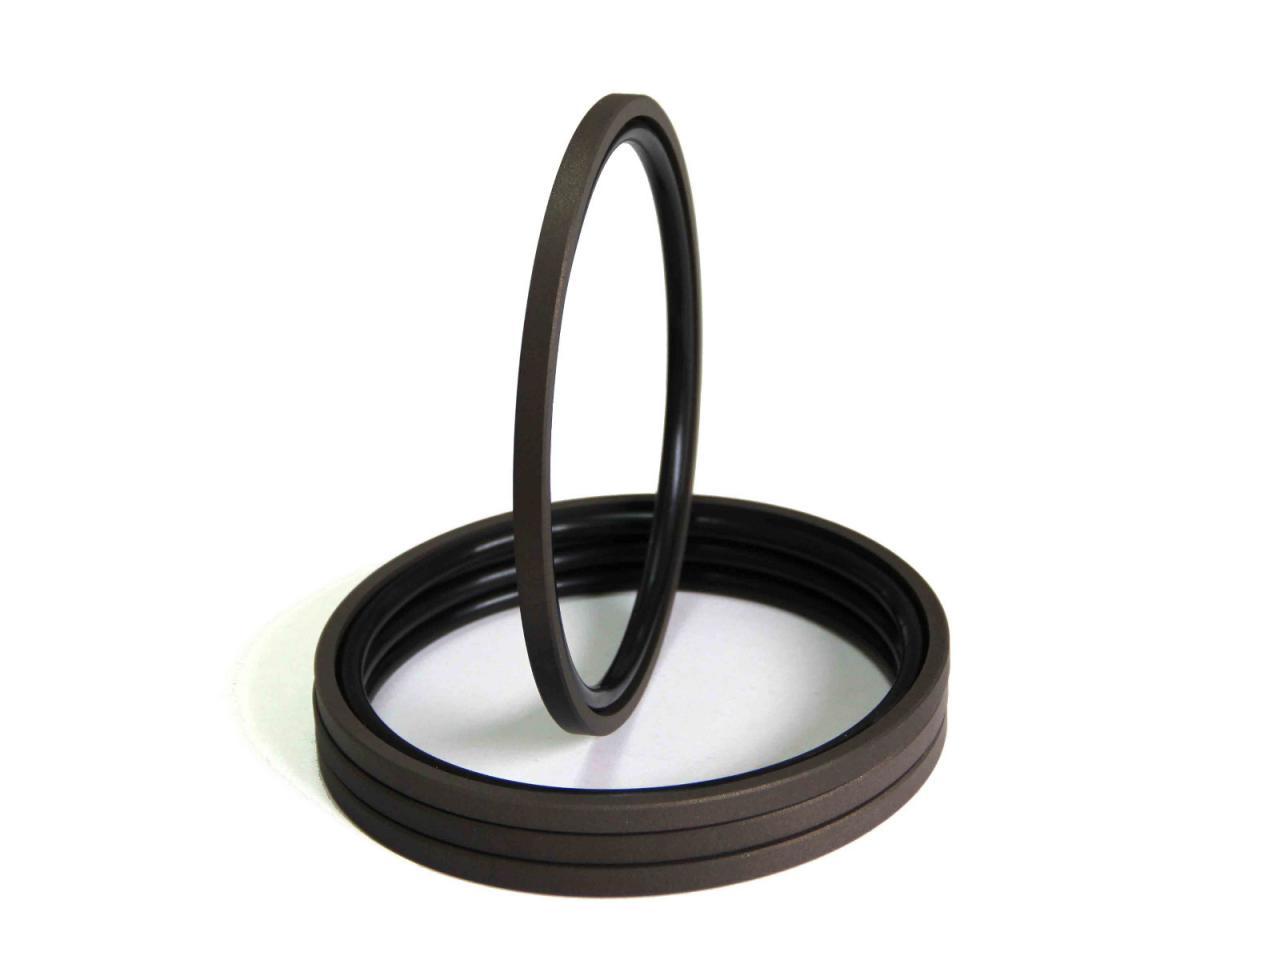 DSH-Piston Seal Design | Piston Seal Bronze Filled PTFE Glyd Ring-7